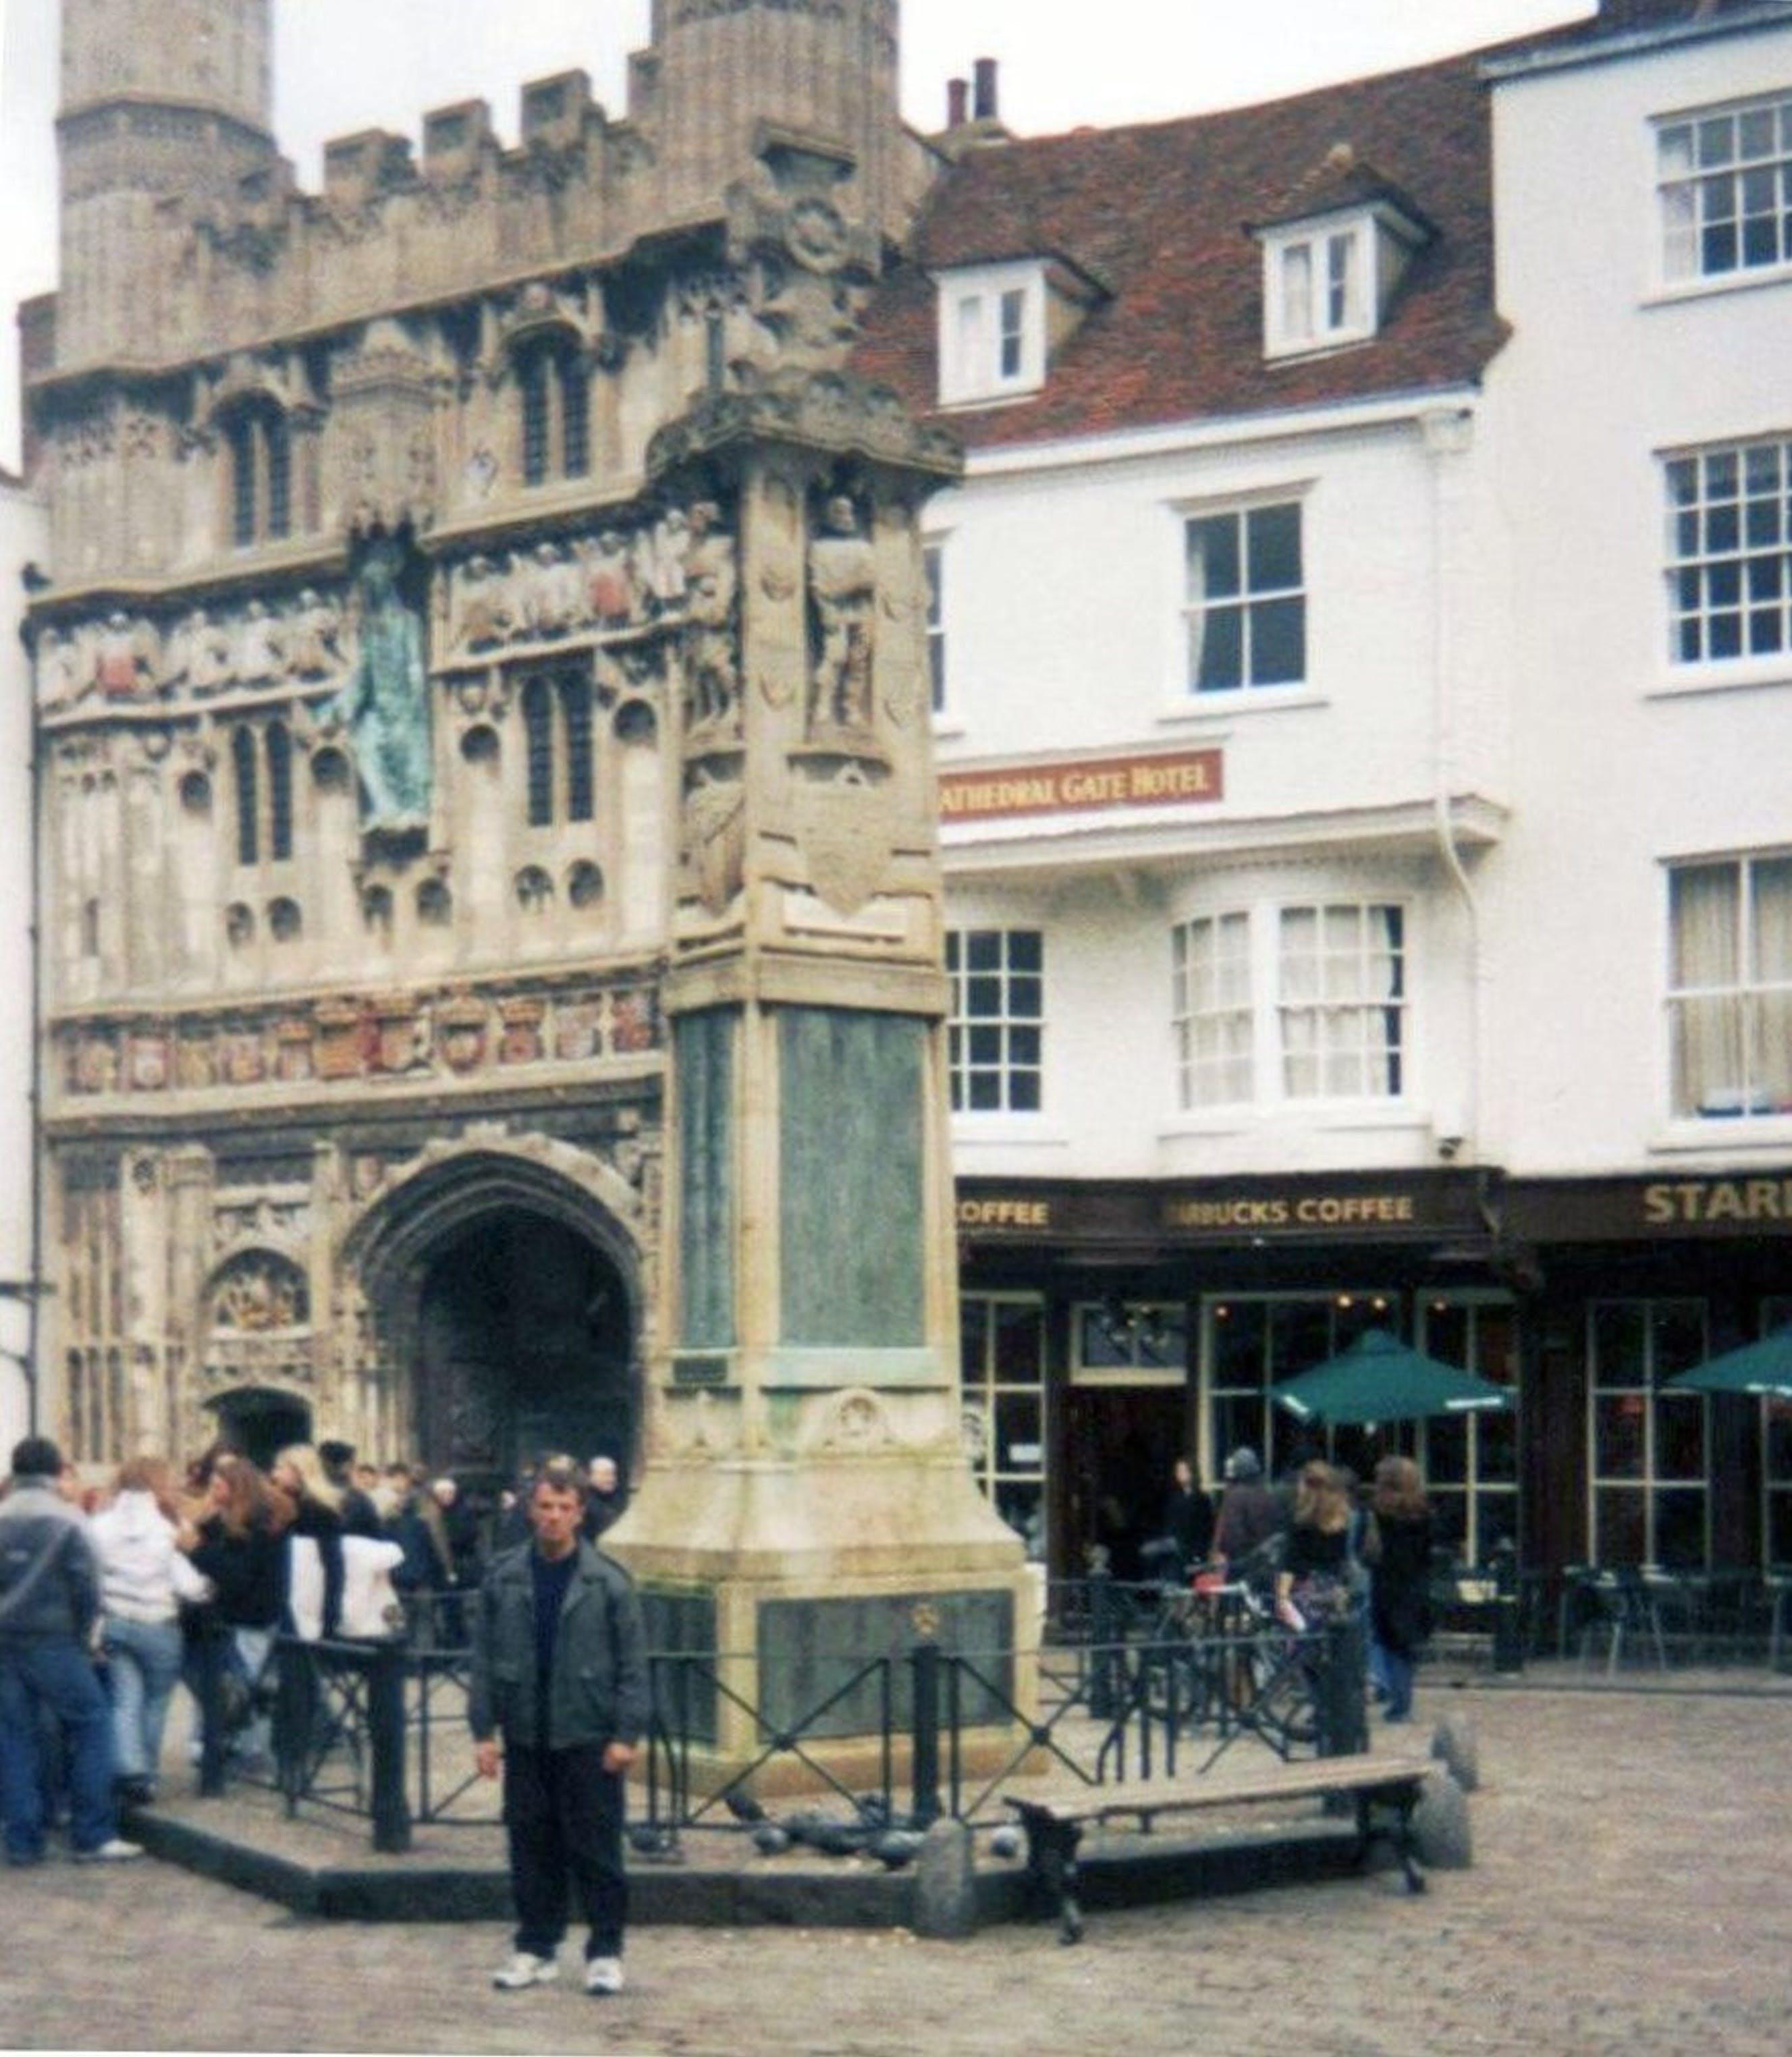 Free stock photo of england, united kingdom, canterbury